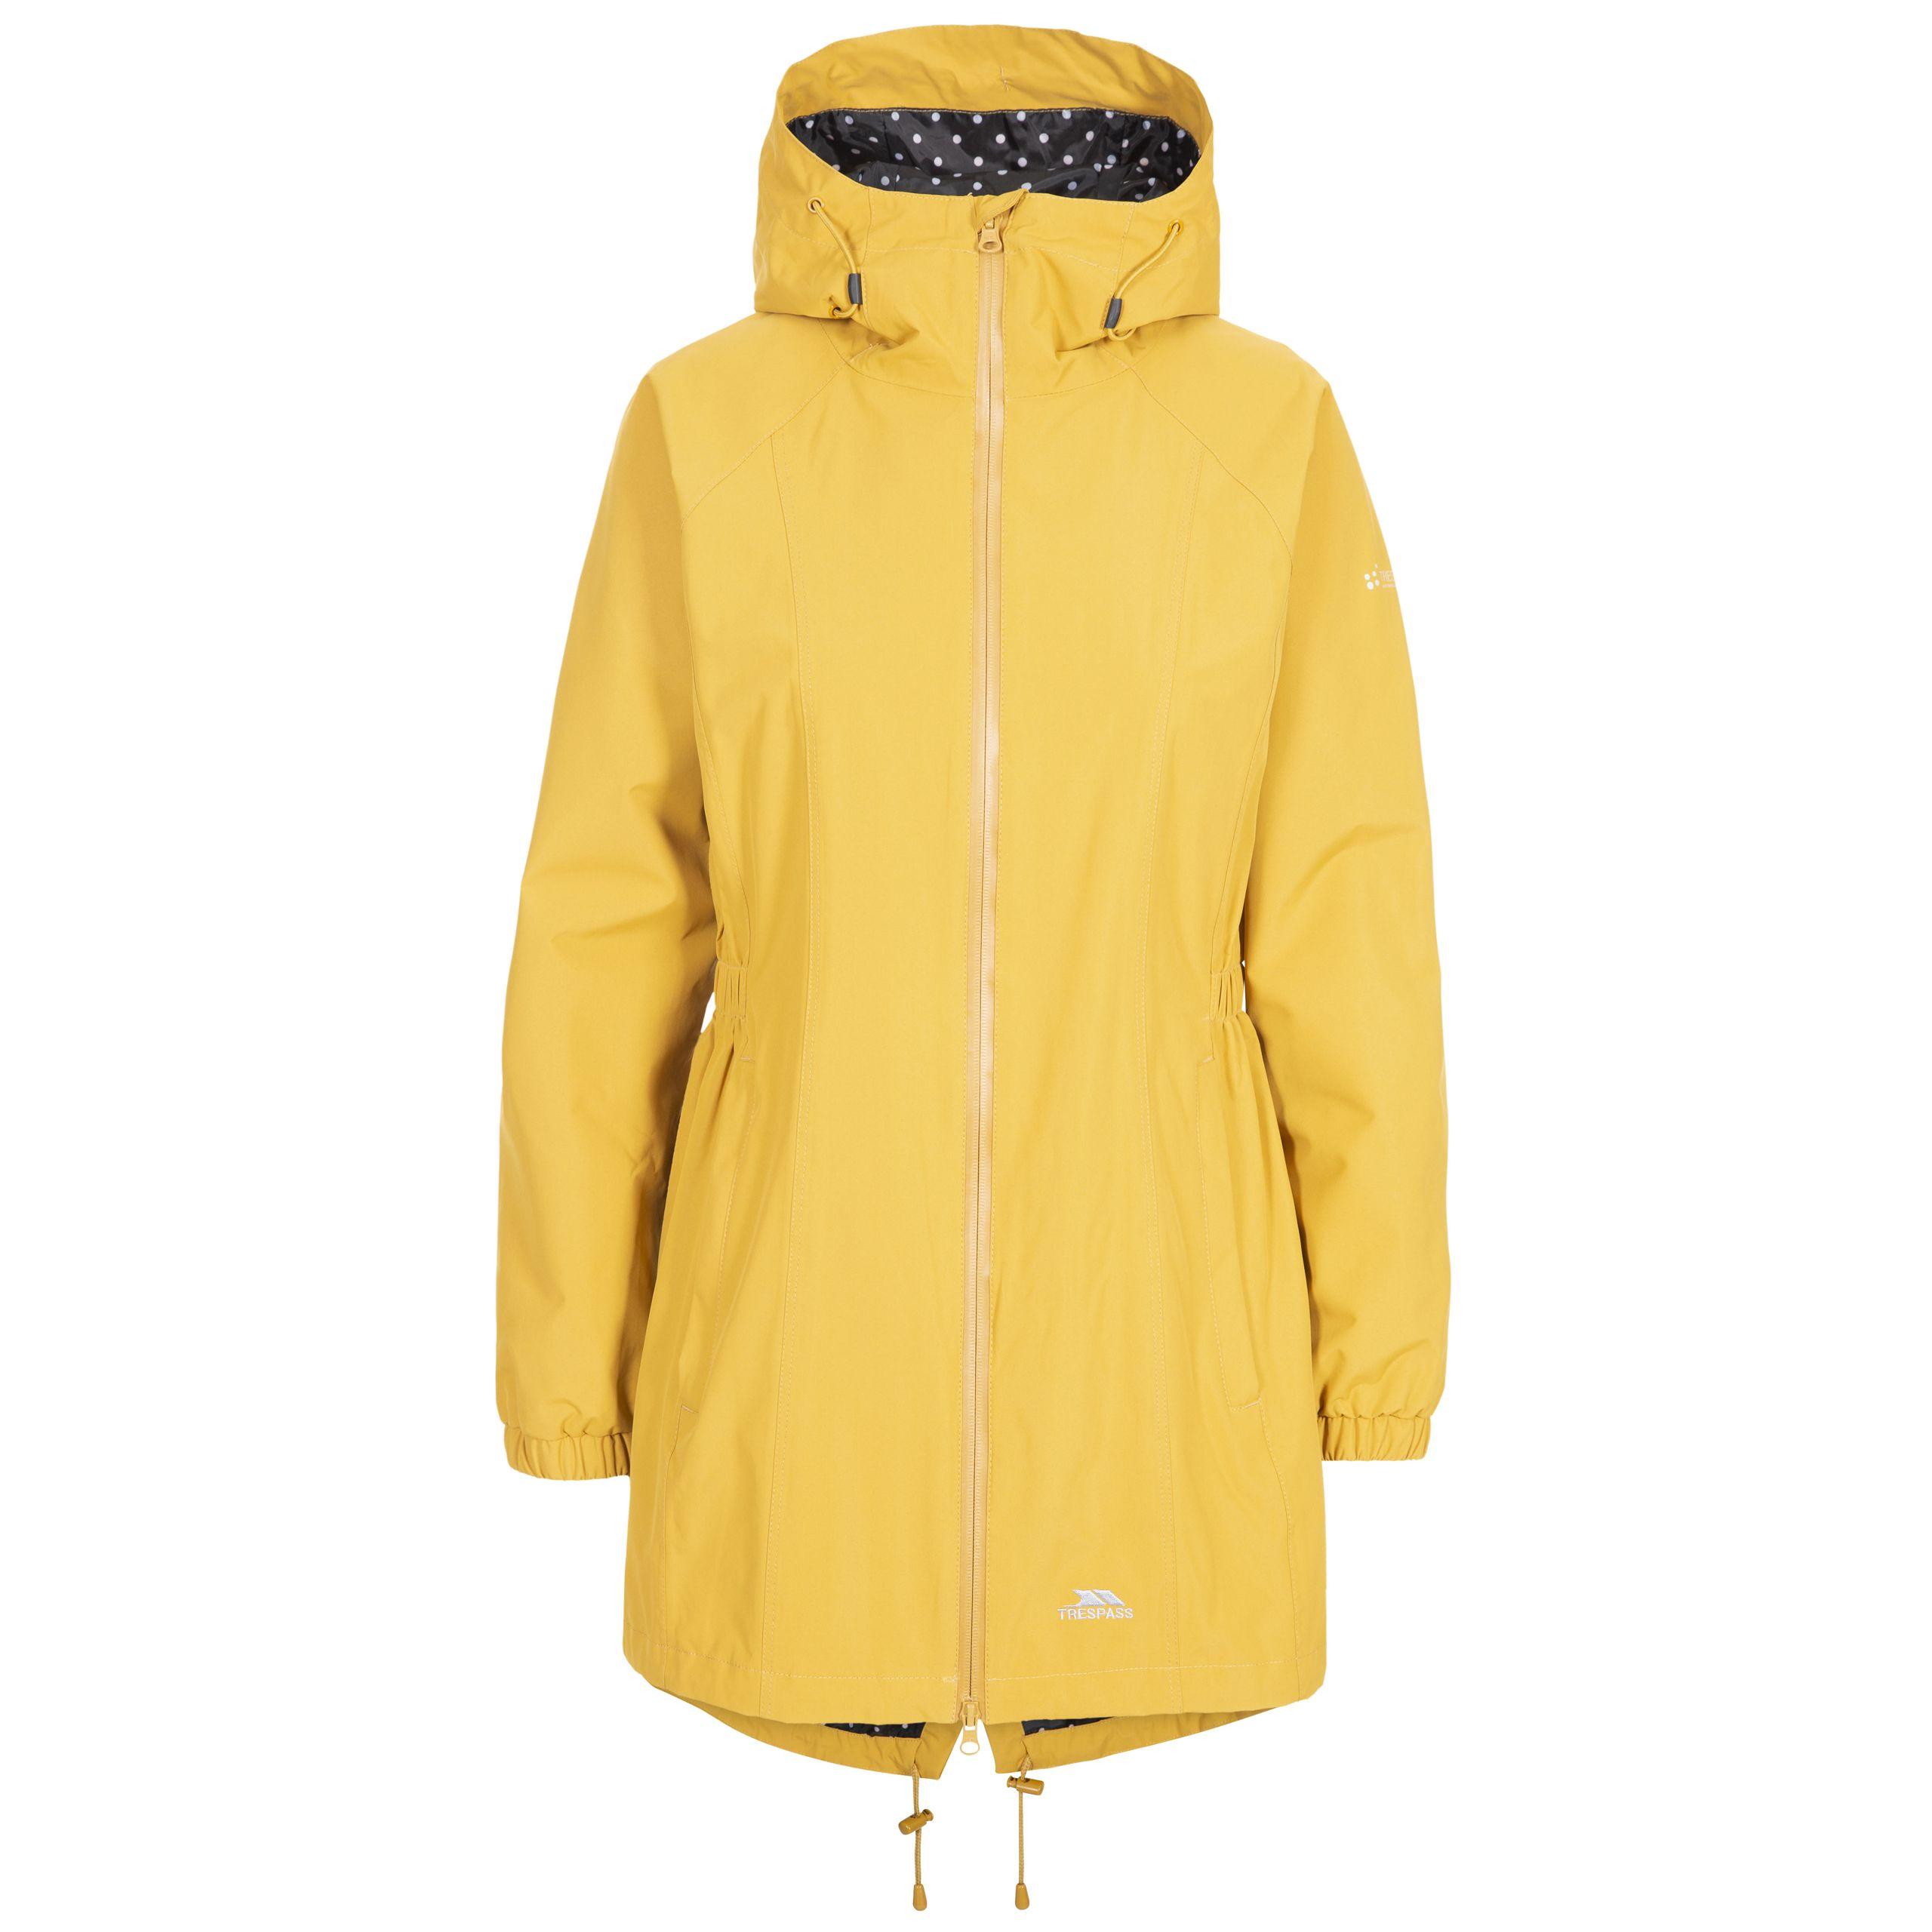 Trespass Womens Daytrip Waterproof Jacket